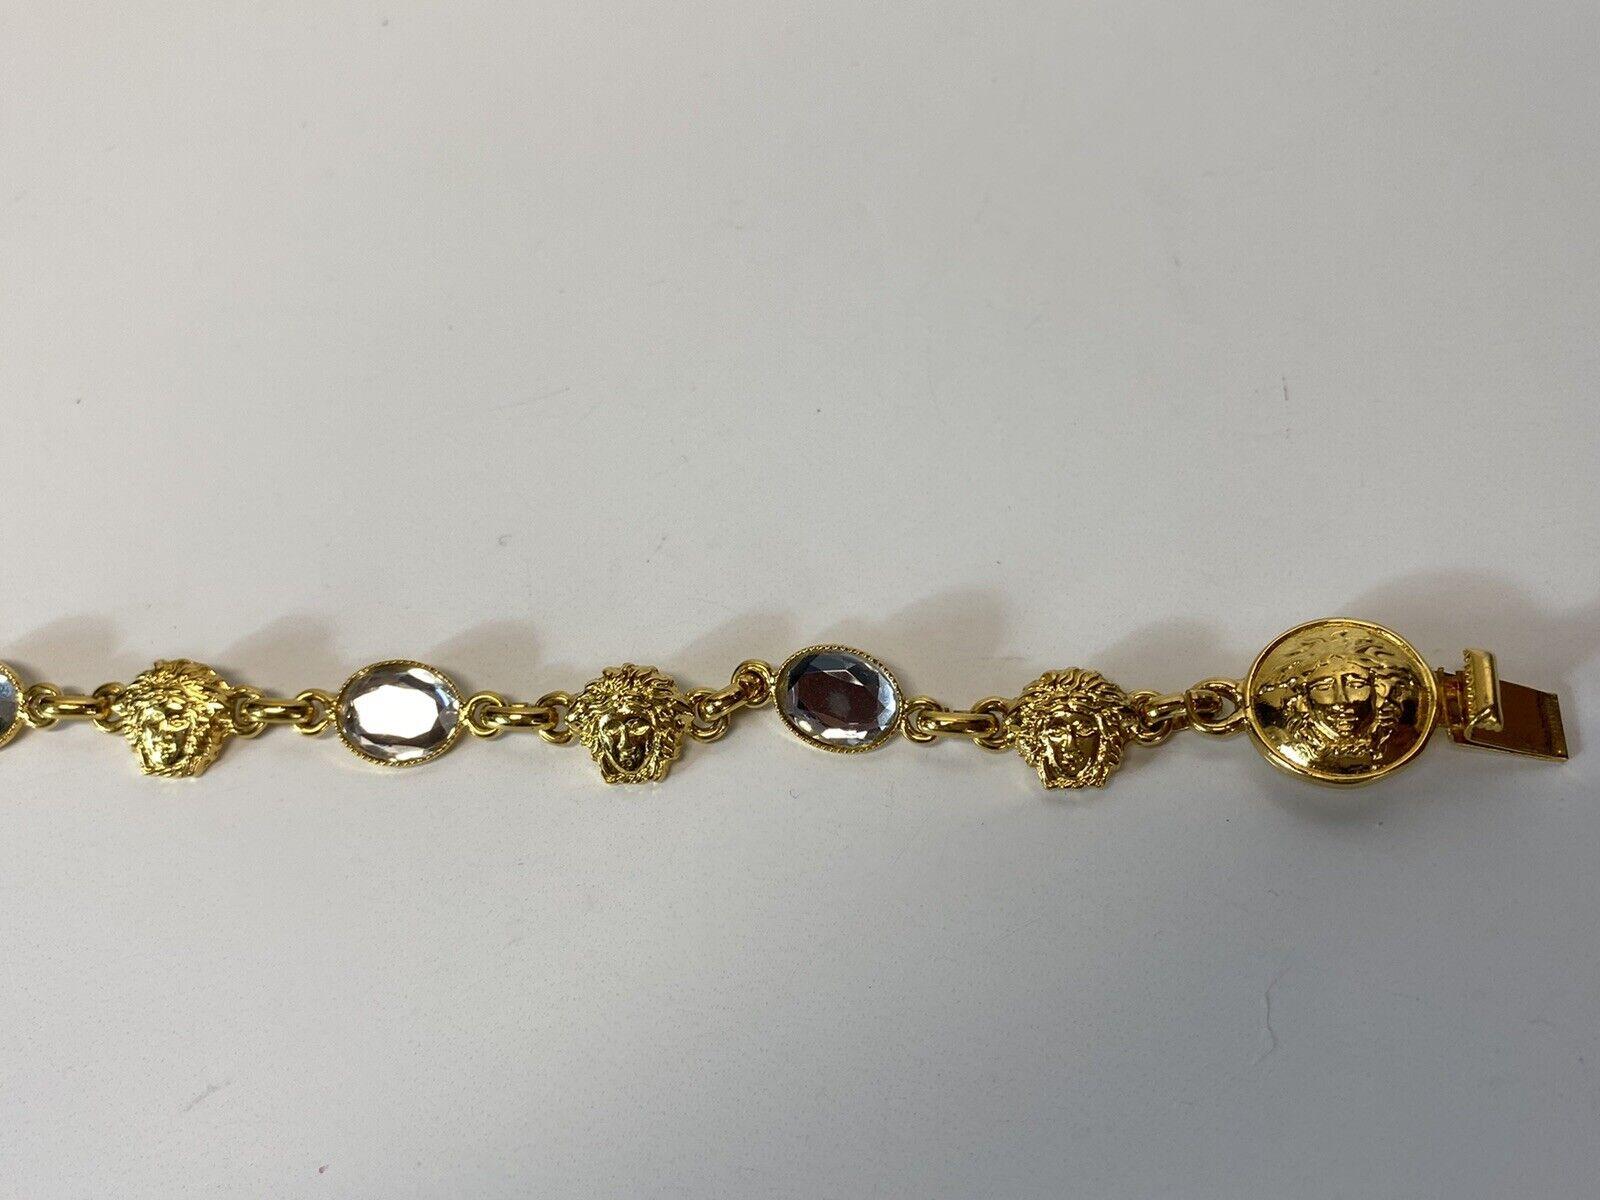 Rare Vtg Gianni Versace Gold Medusa Crystal Brace… - image 2